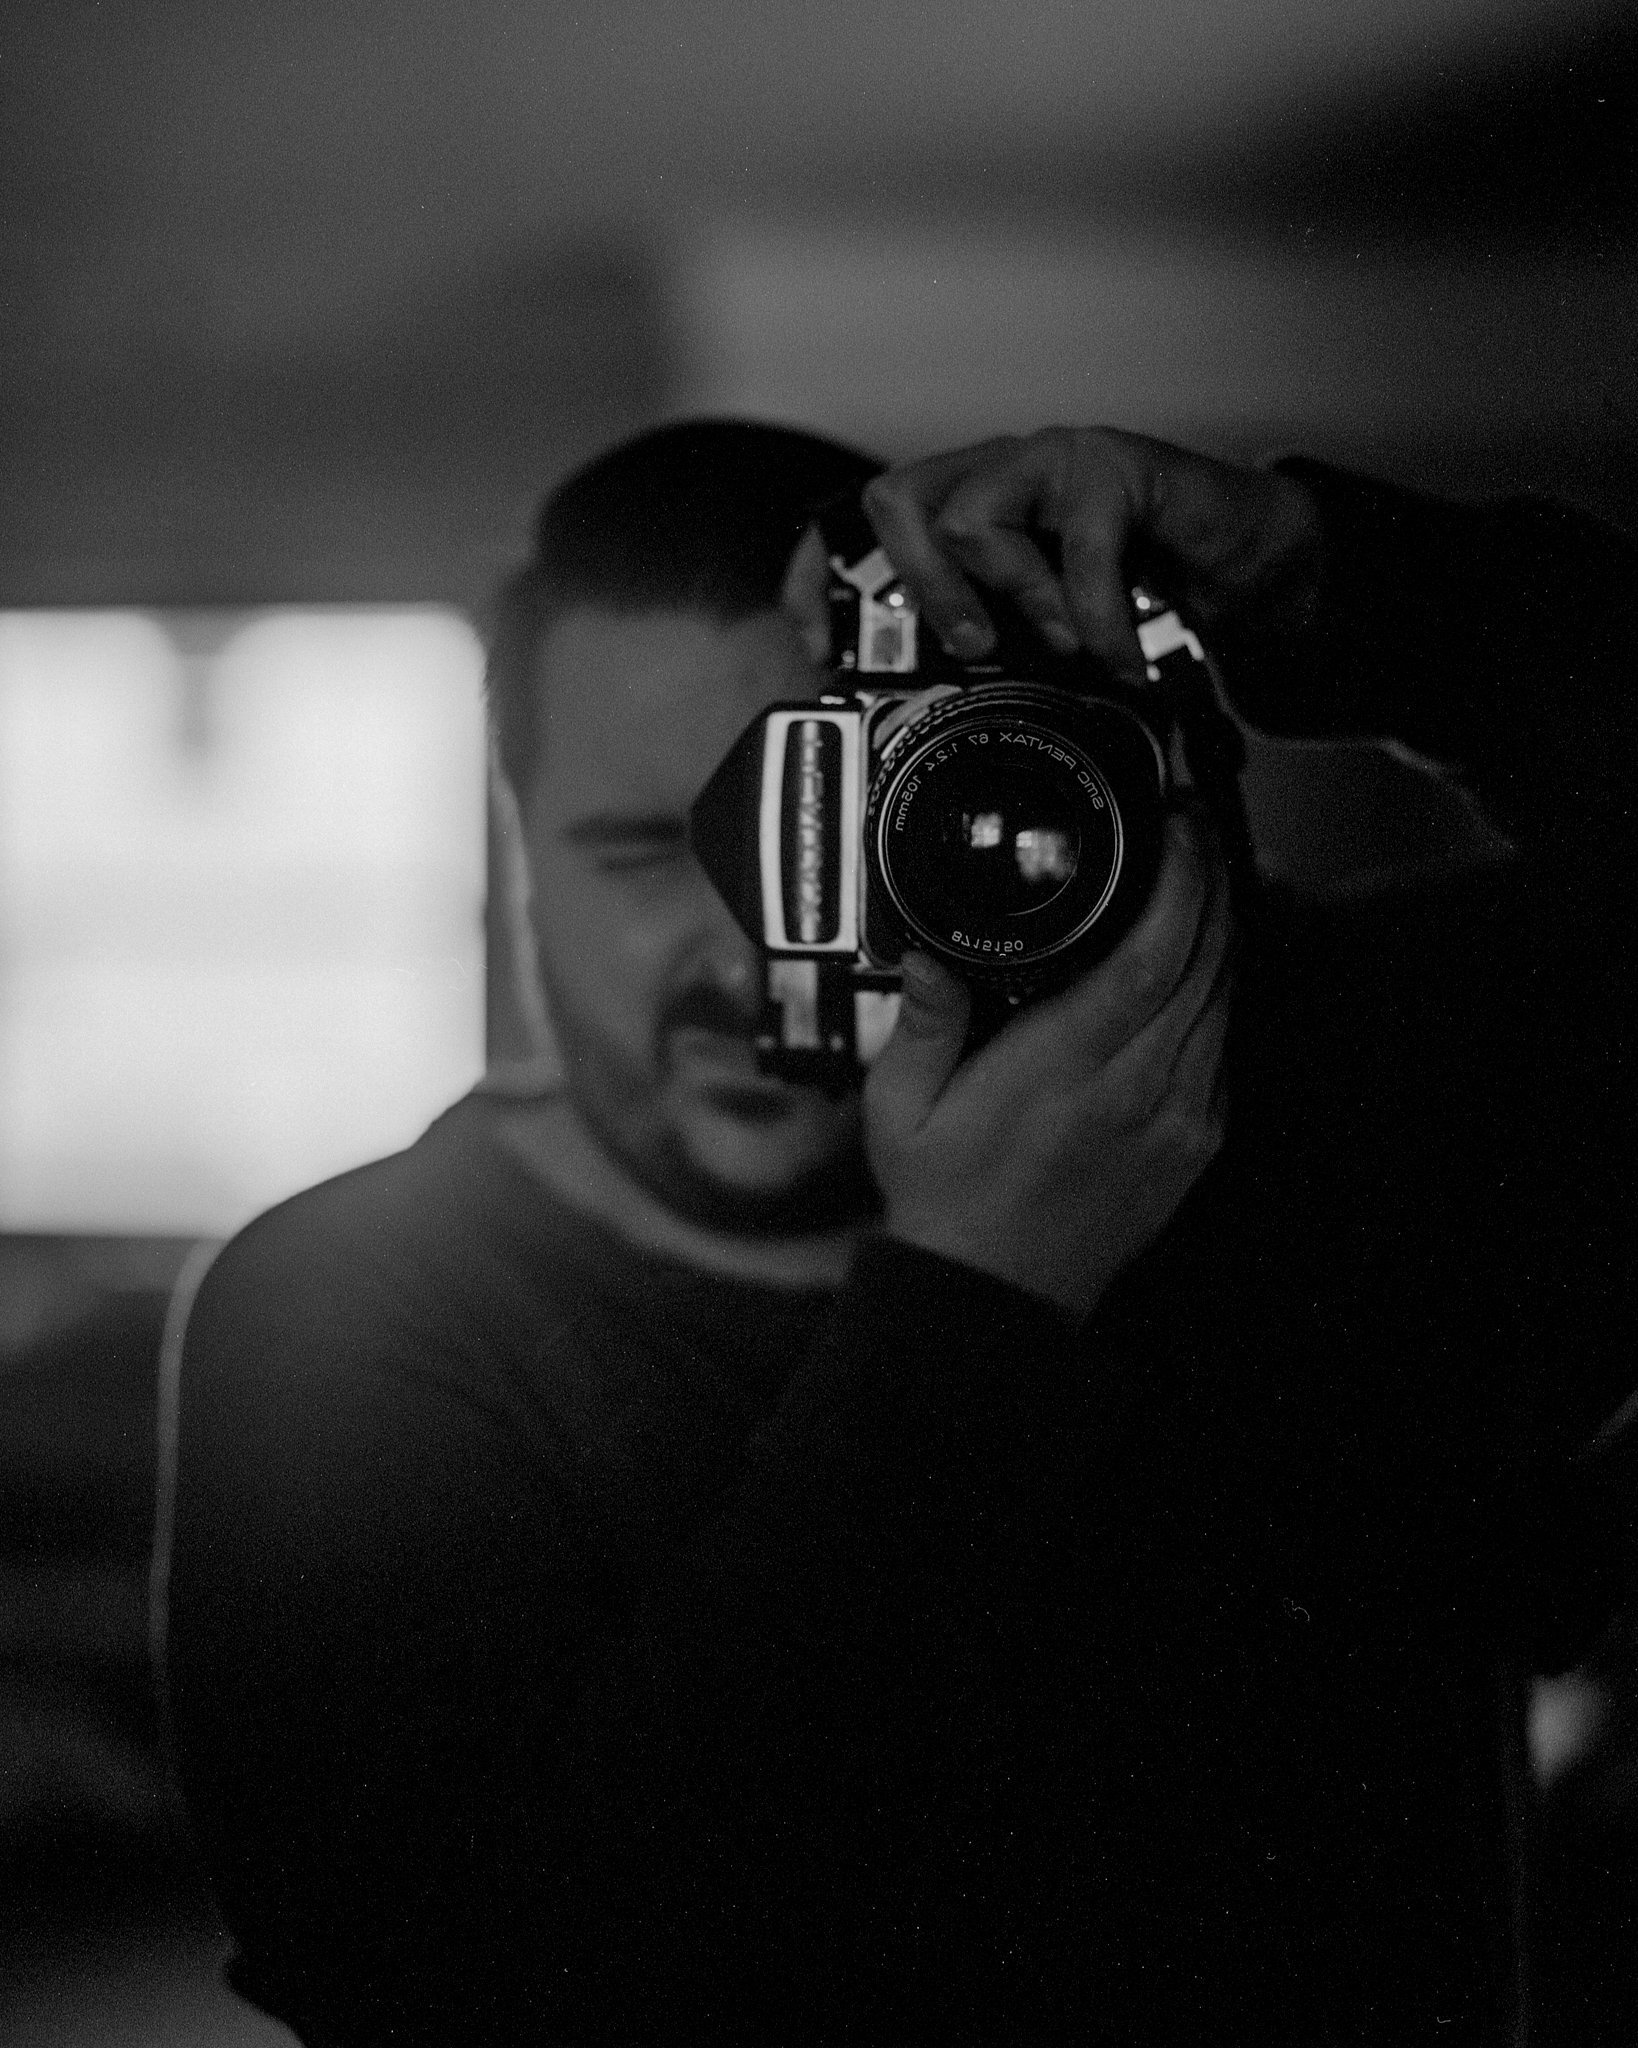 Mirror self portrait using the Pentax 6x7